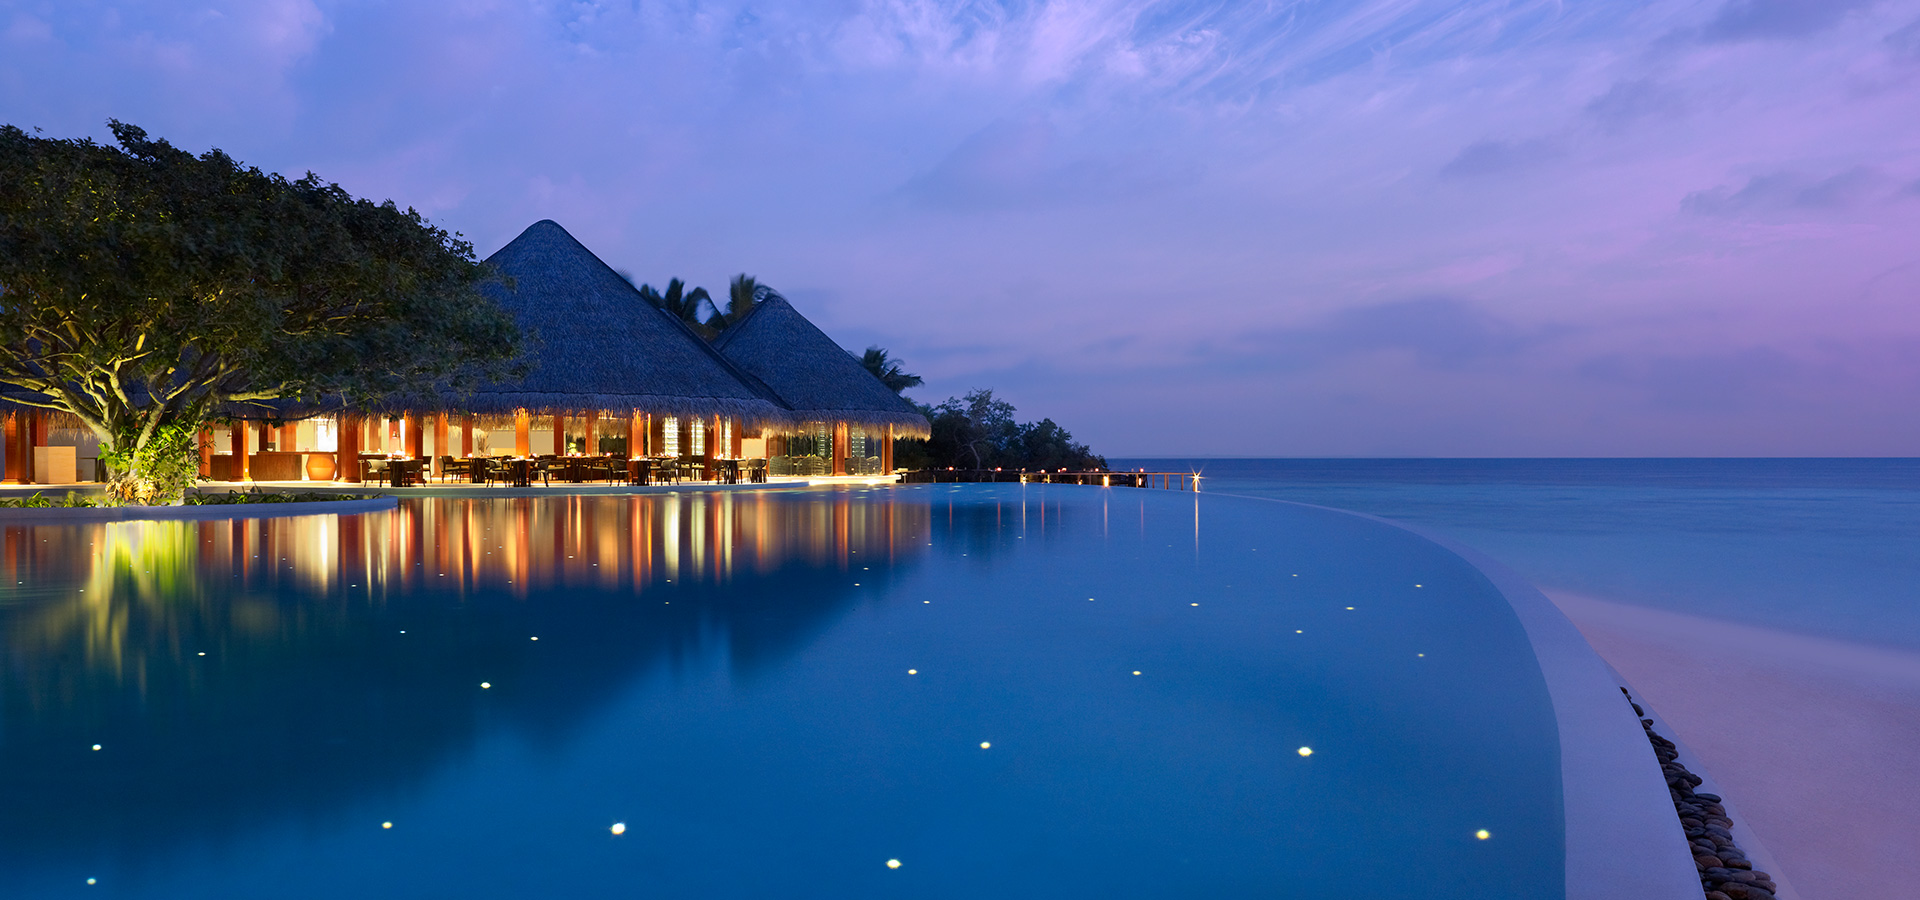 Dusit Thani Maldives, Mudhdhoo Island, Maldivi